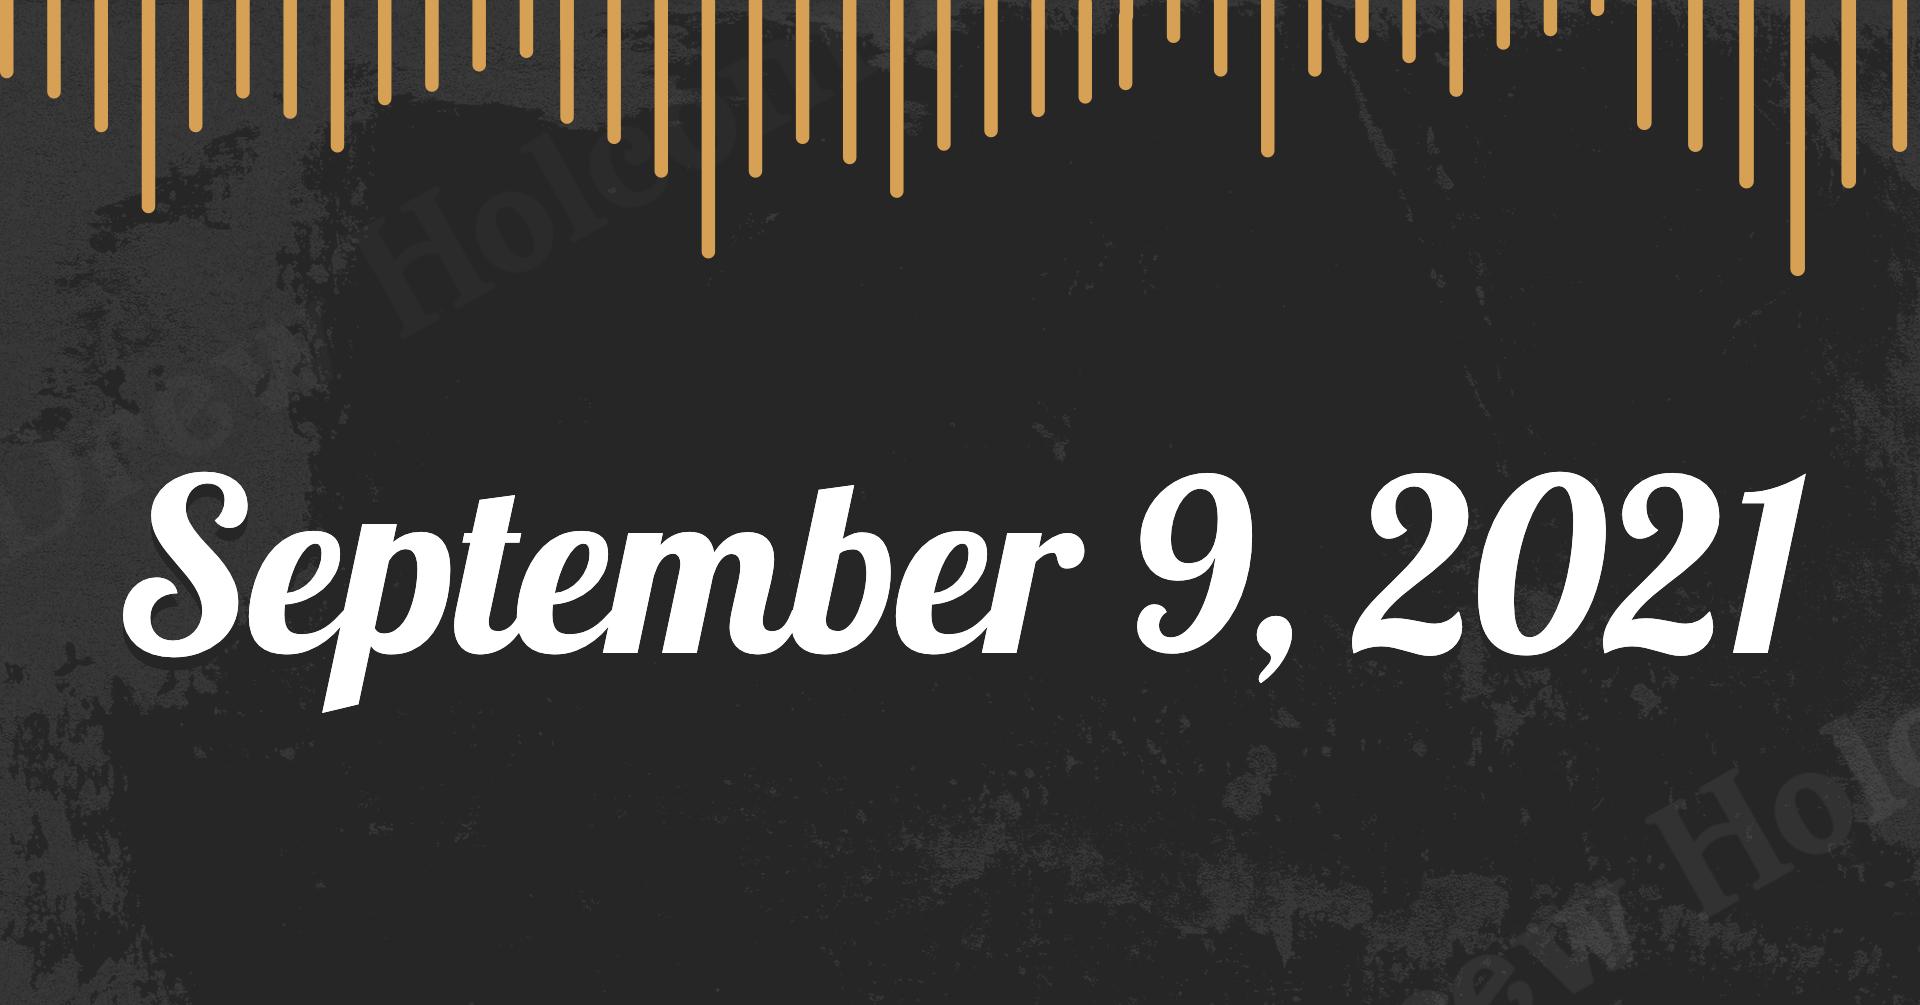 September 9 2021 Concert